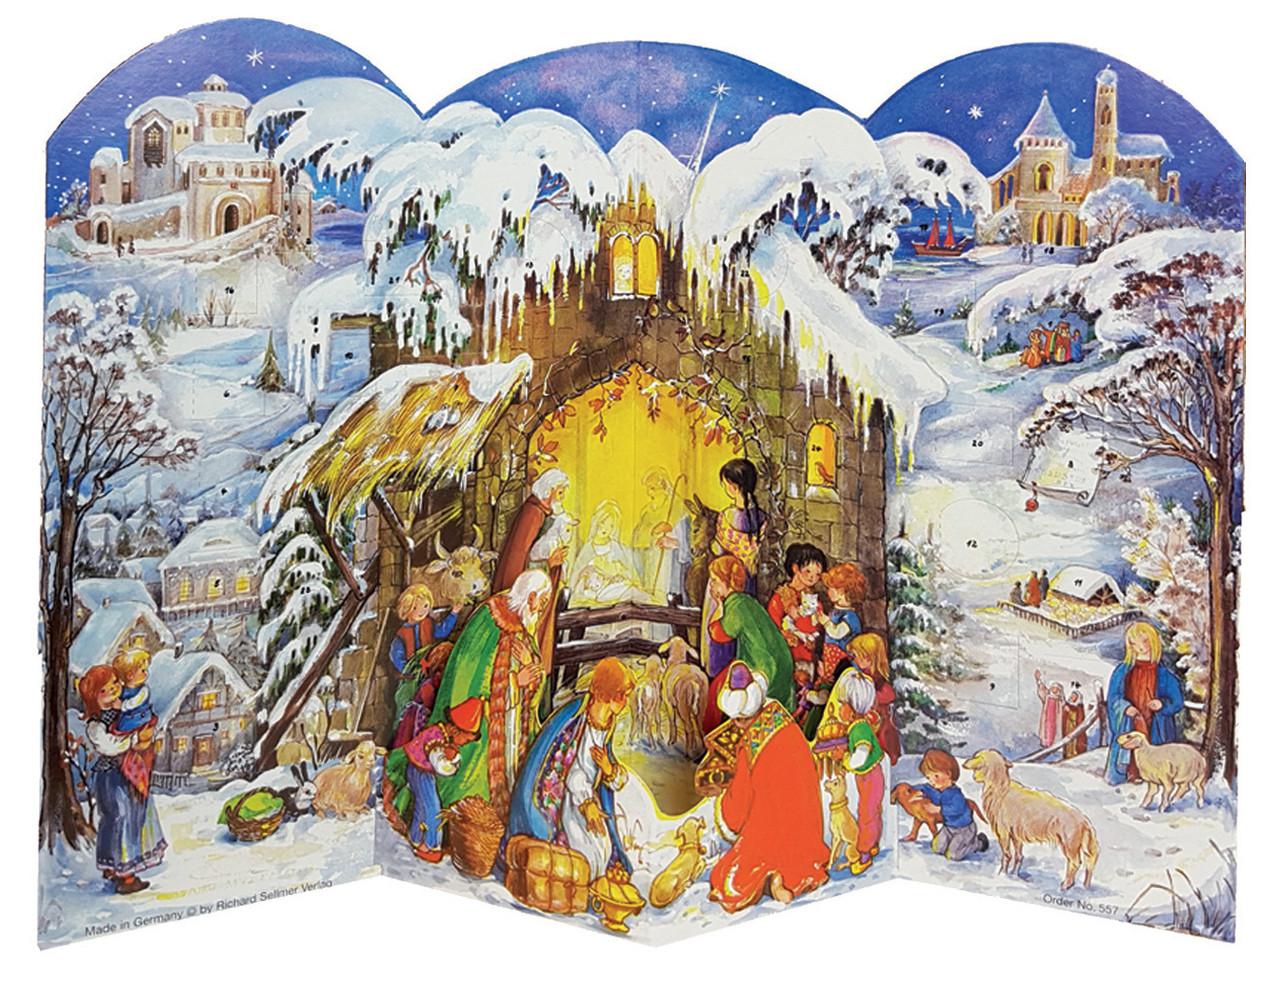 3D Nativity Scene German Advent Calendar